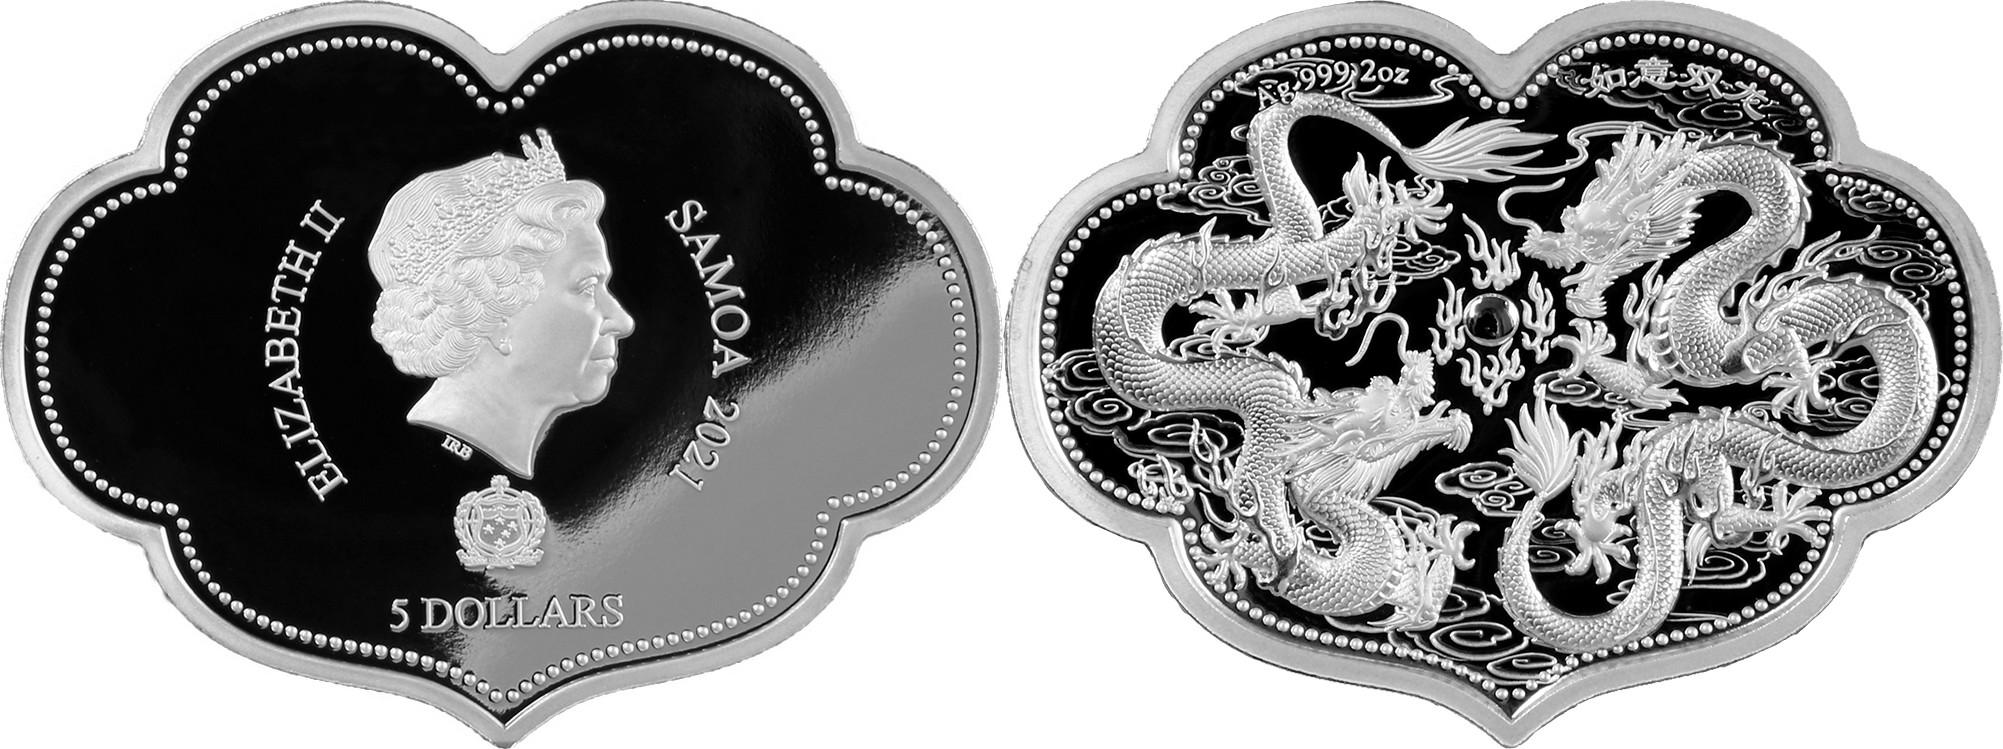 samoa-2021-voeu-double-dragon